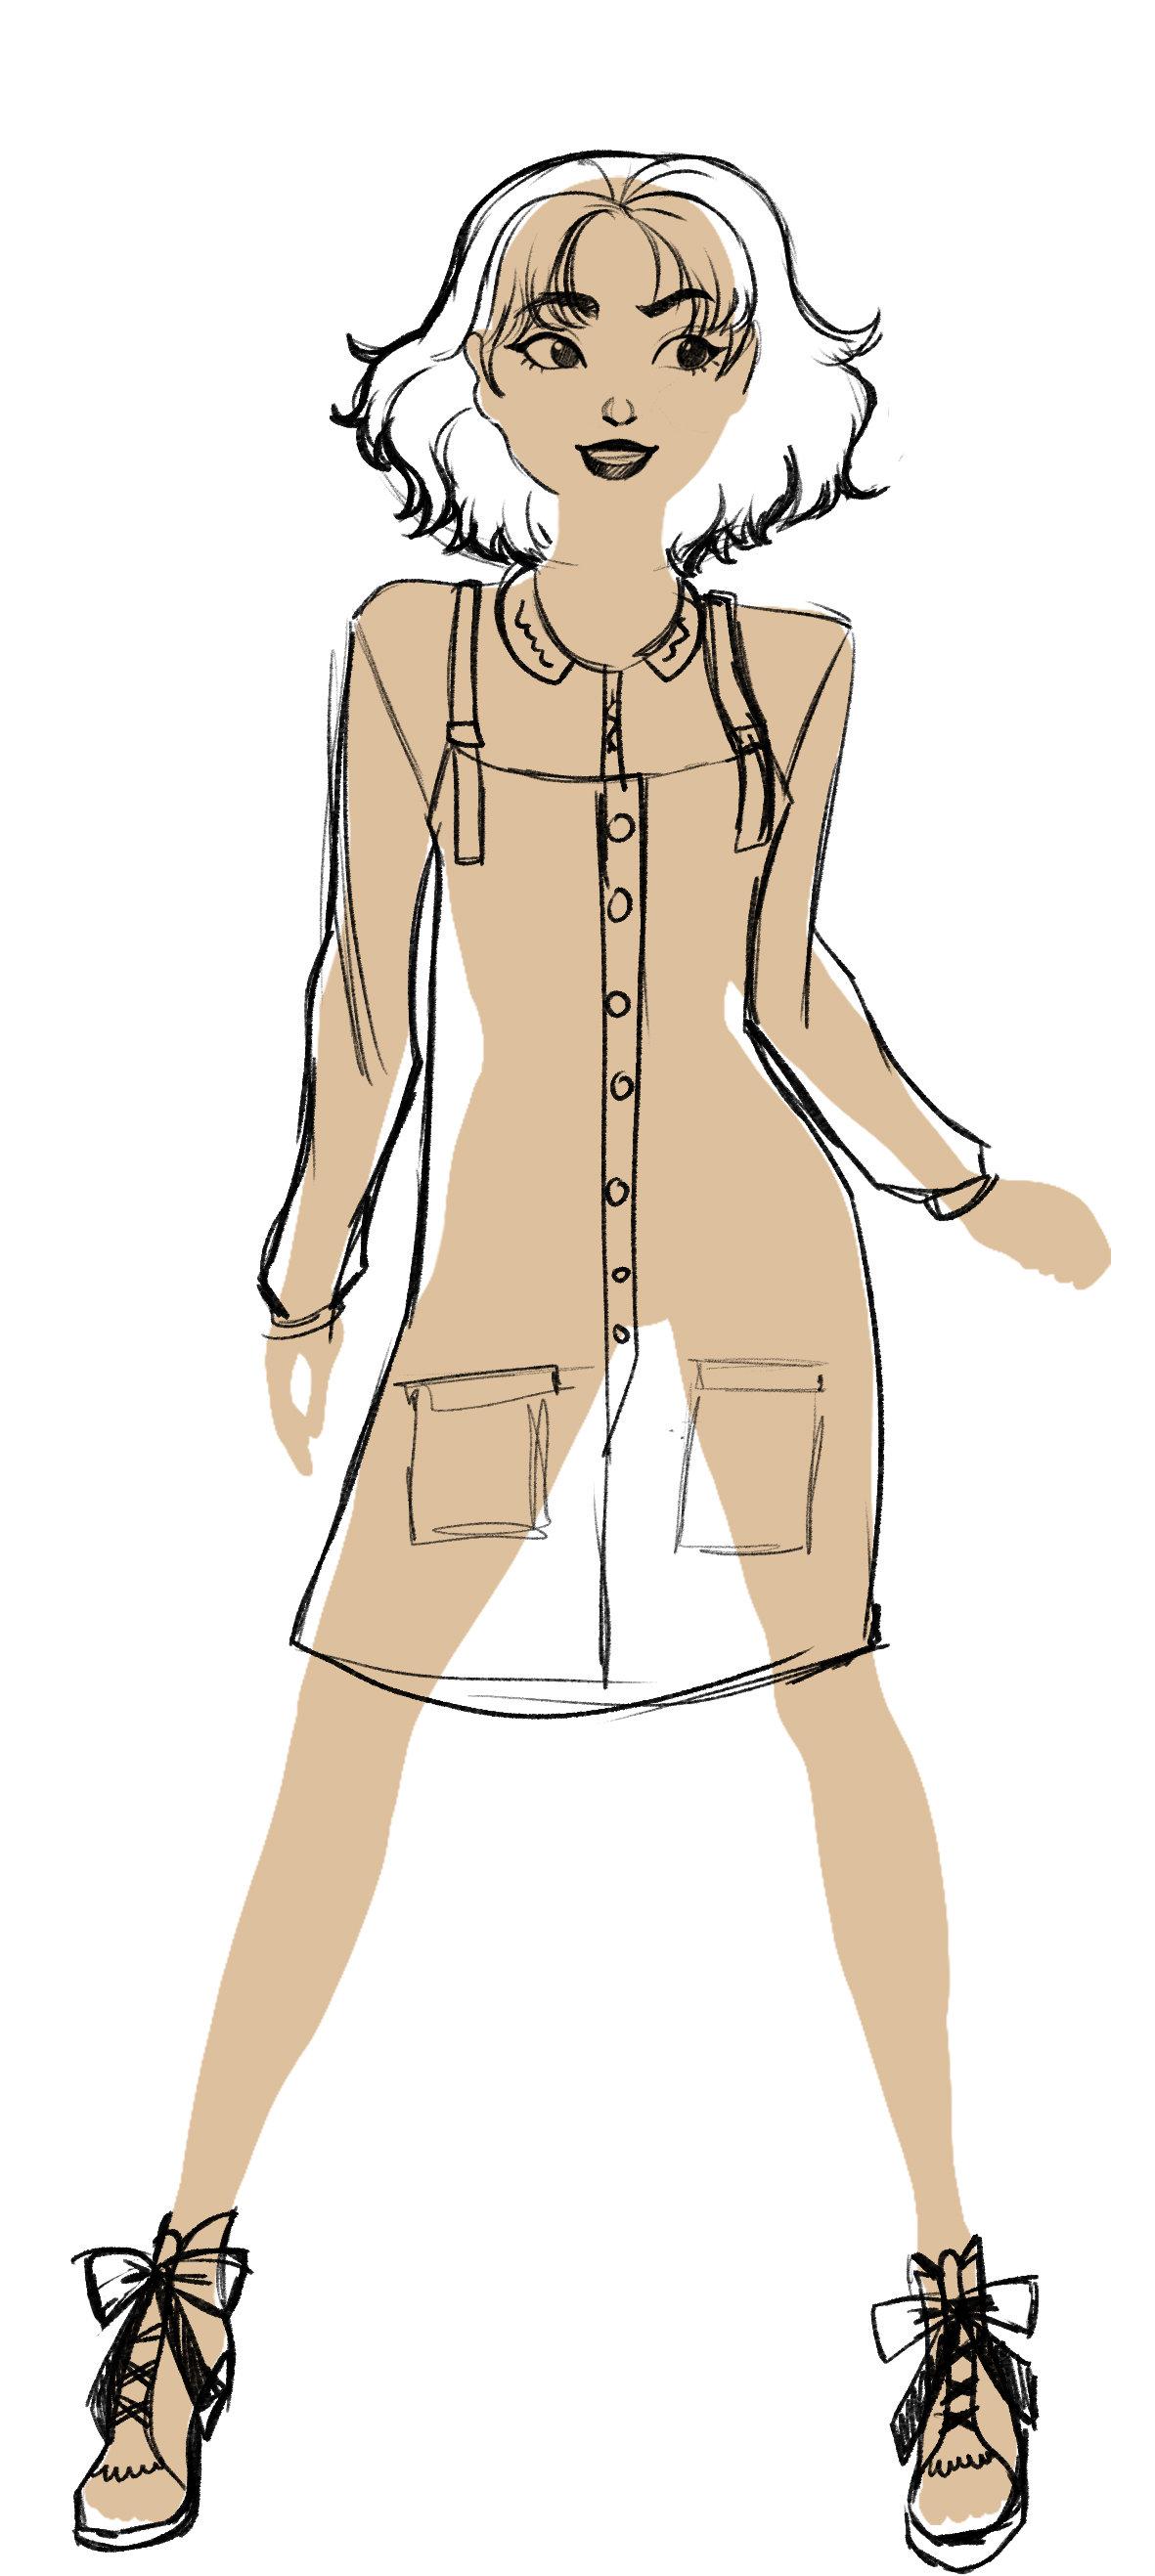 crayonné prochaine tenue